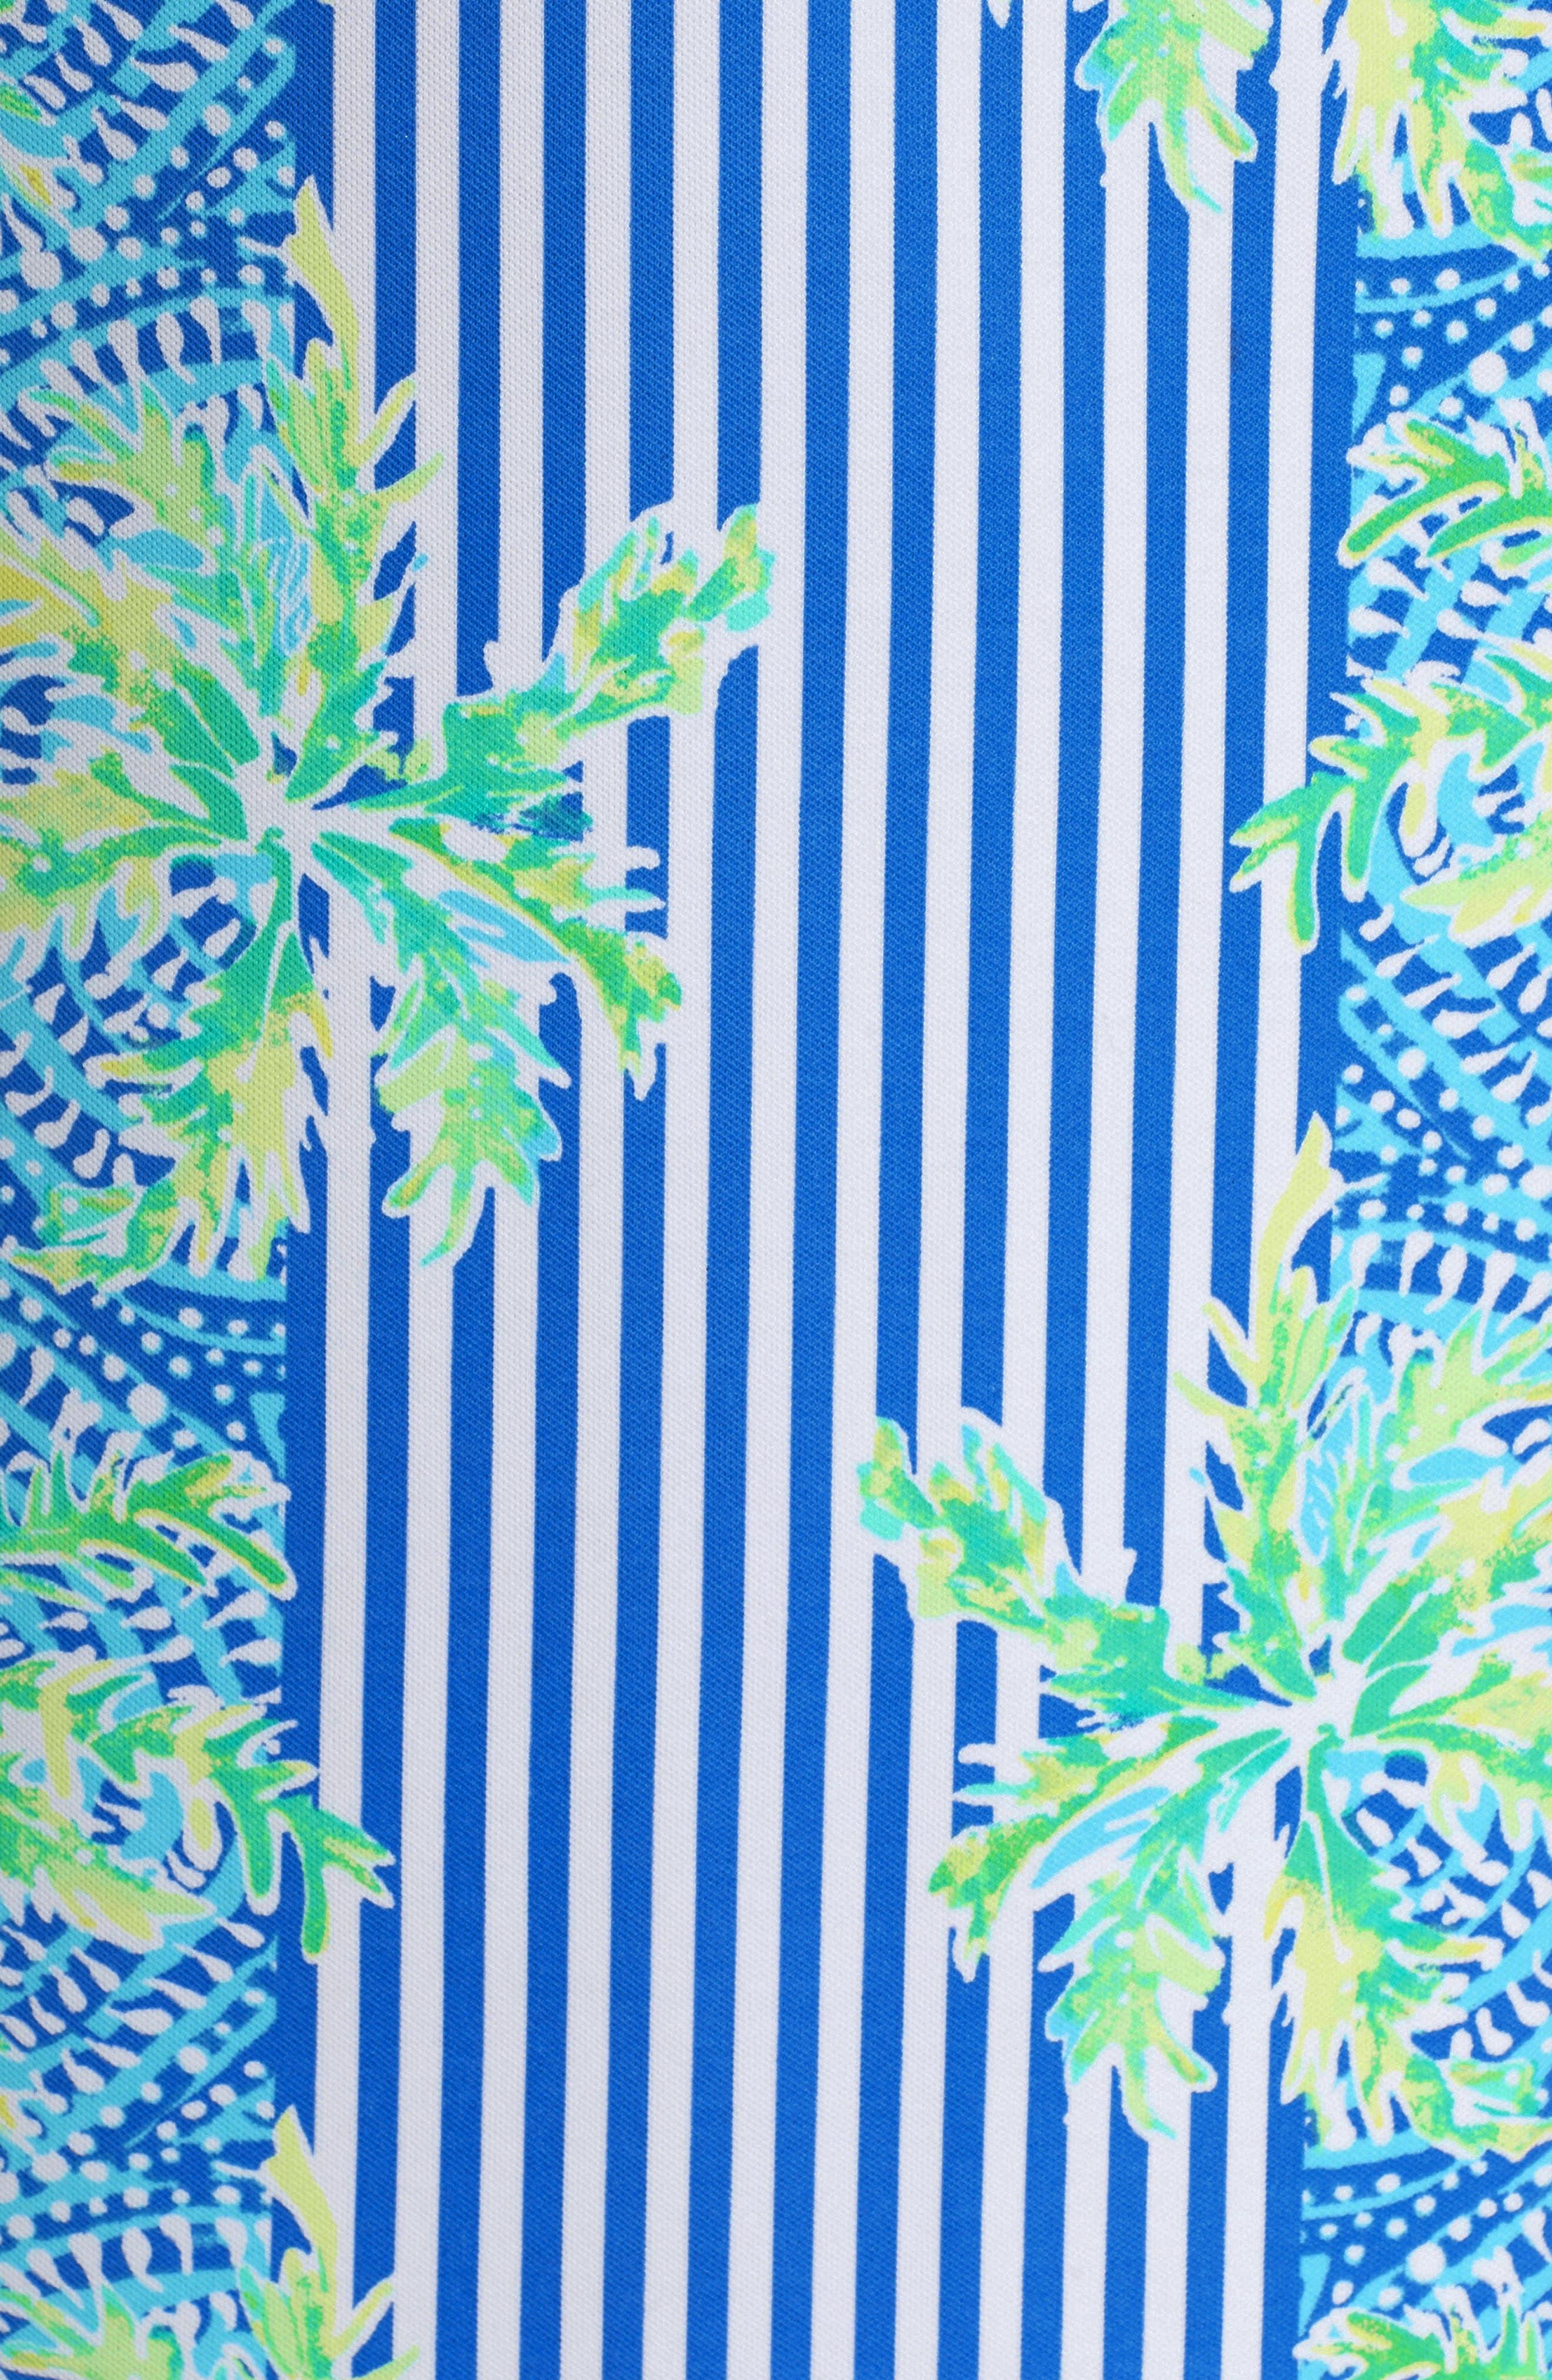 Chiara Stripe & Floral Print Dress,                             Alternate thumbnail 6, color,                             BENNET BLUE TROPIC LIKE ITS